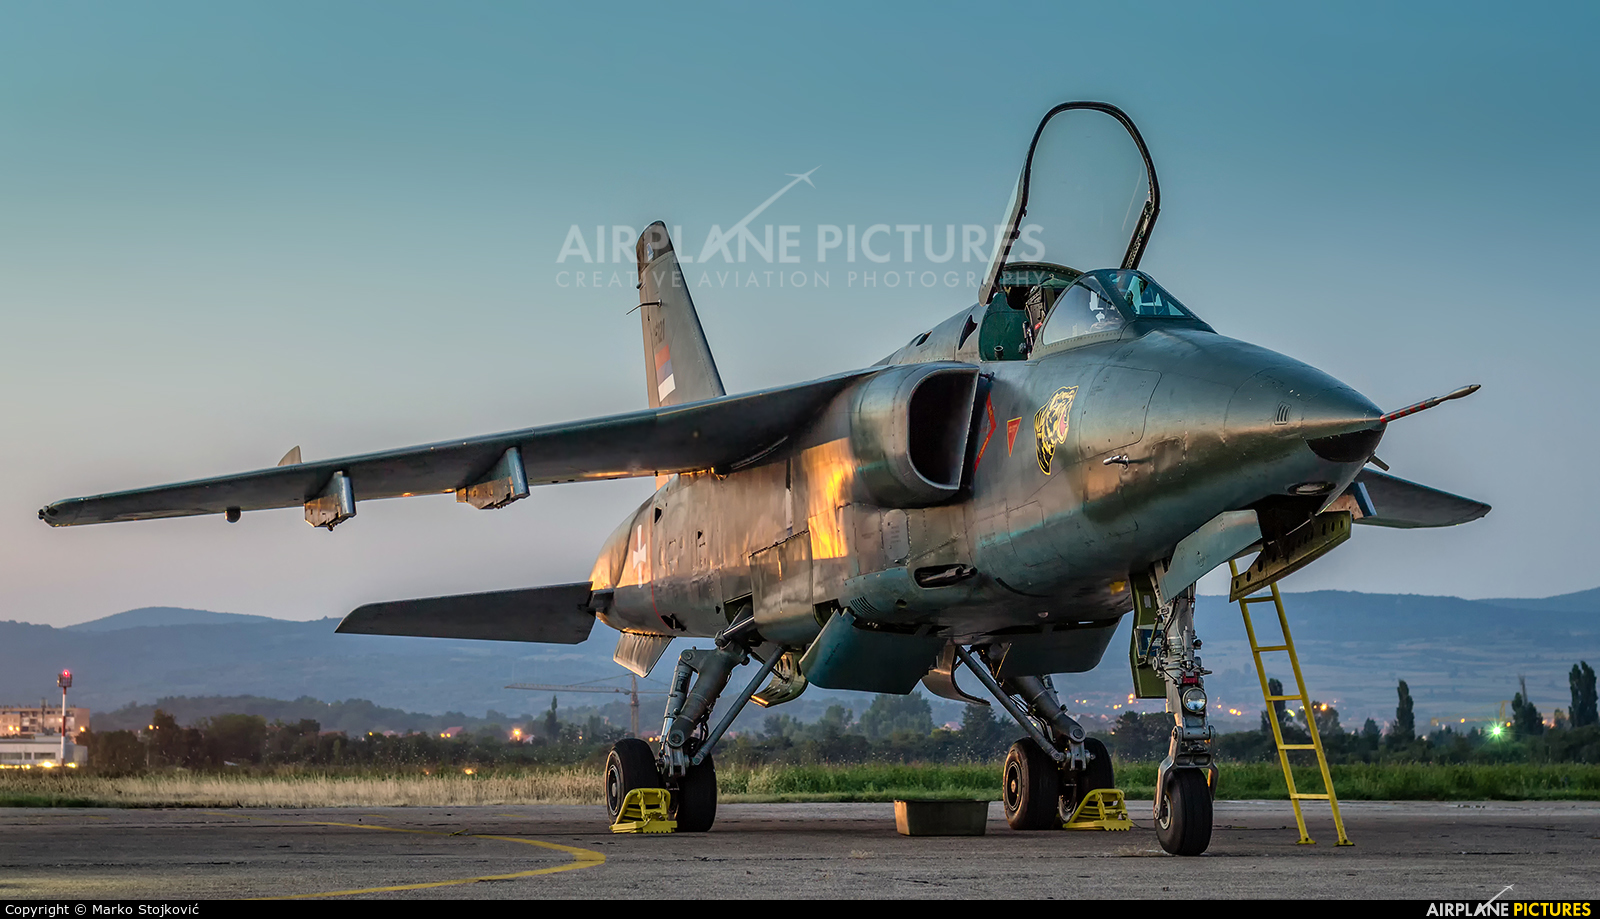 Serbia - Air Force 25121 aircraft at Nis - Konstantin Veliki